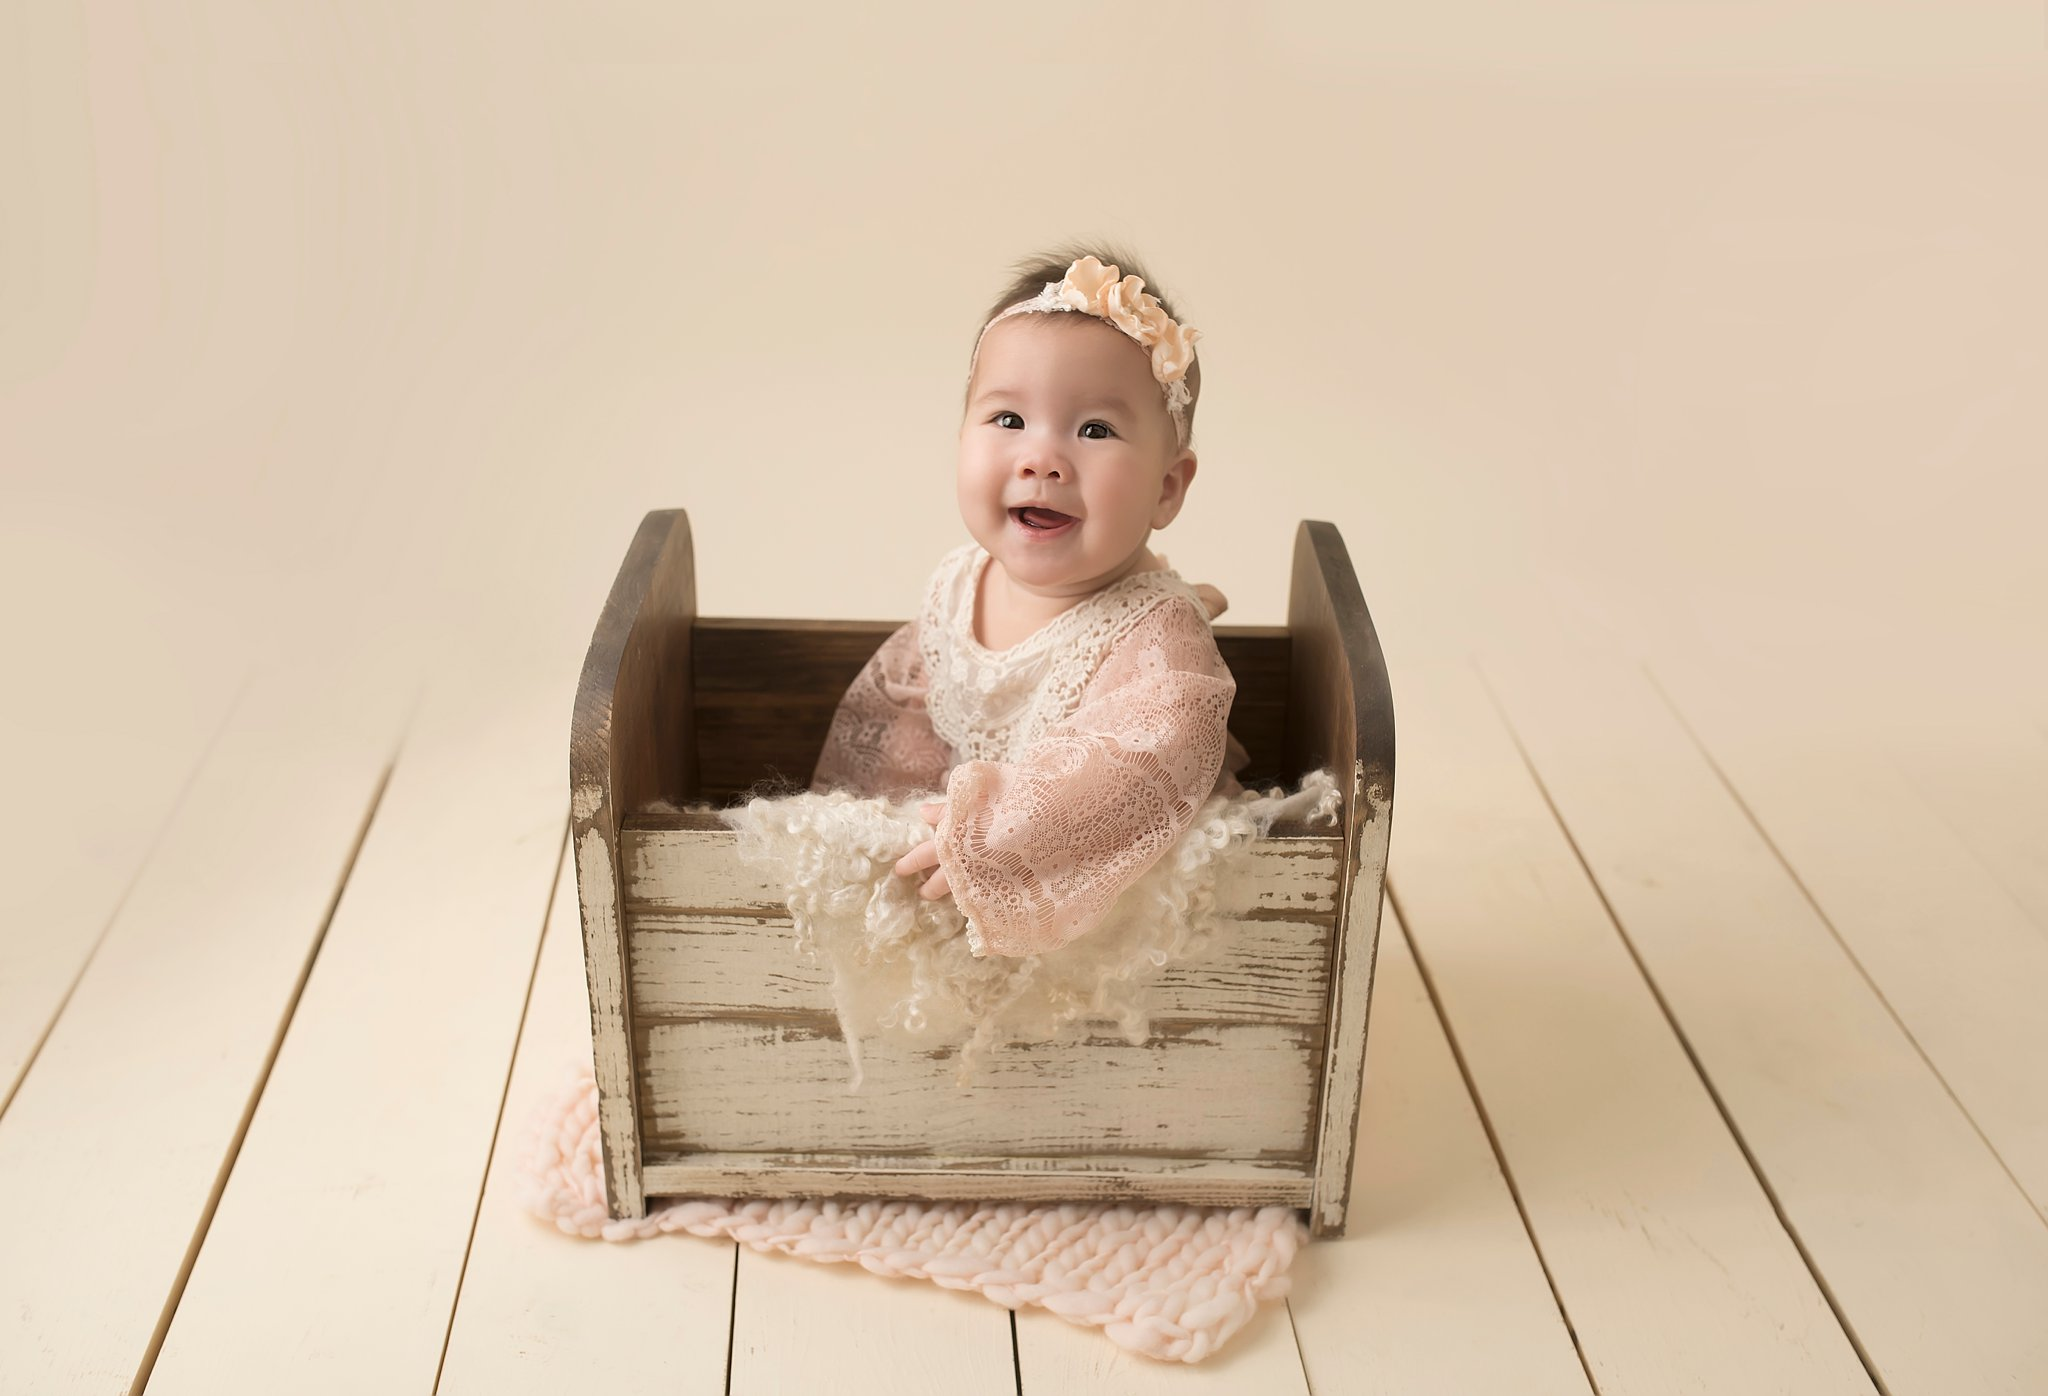 jacquelinemariephotography-babyphotographer-columbusohio_1.jpg